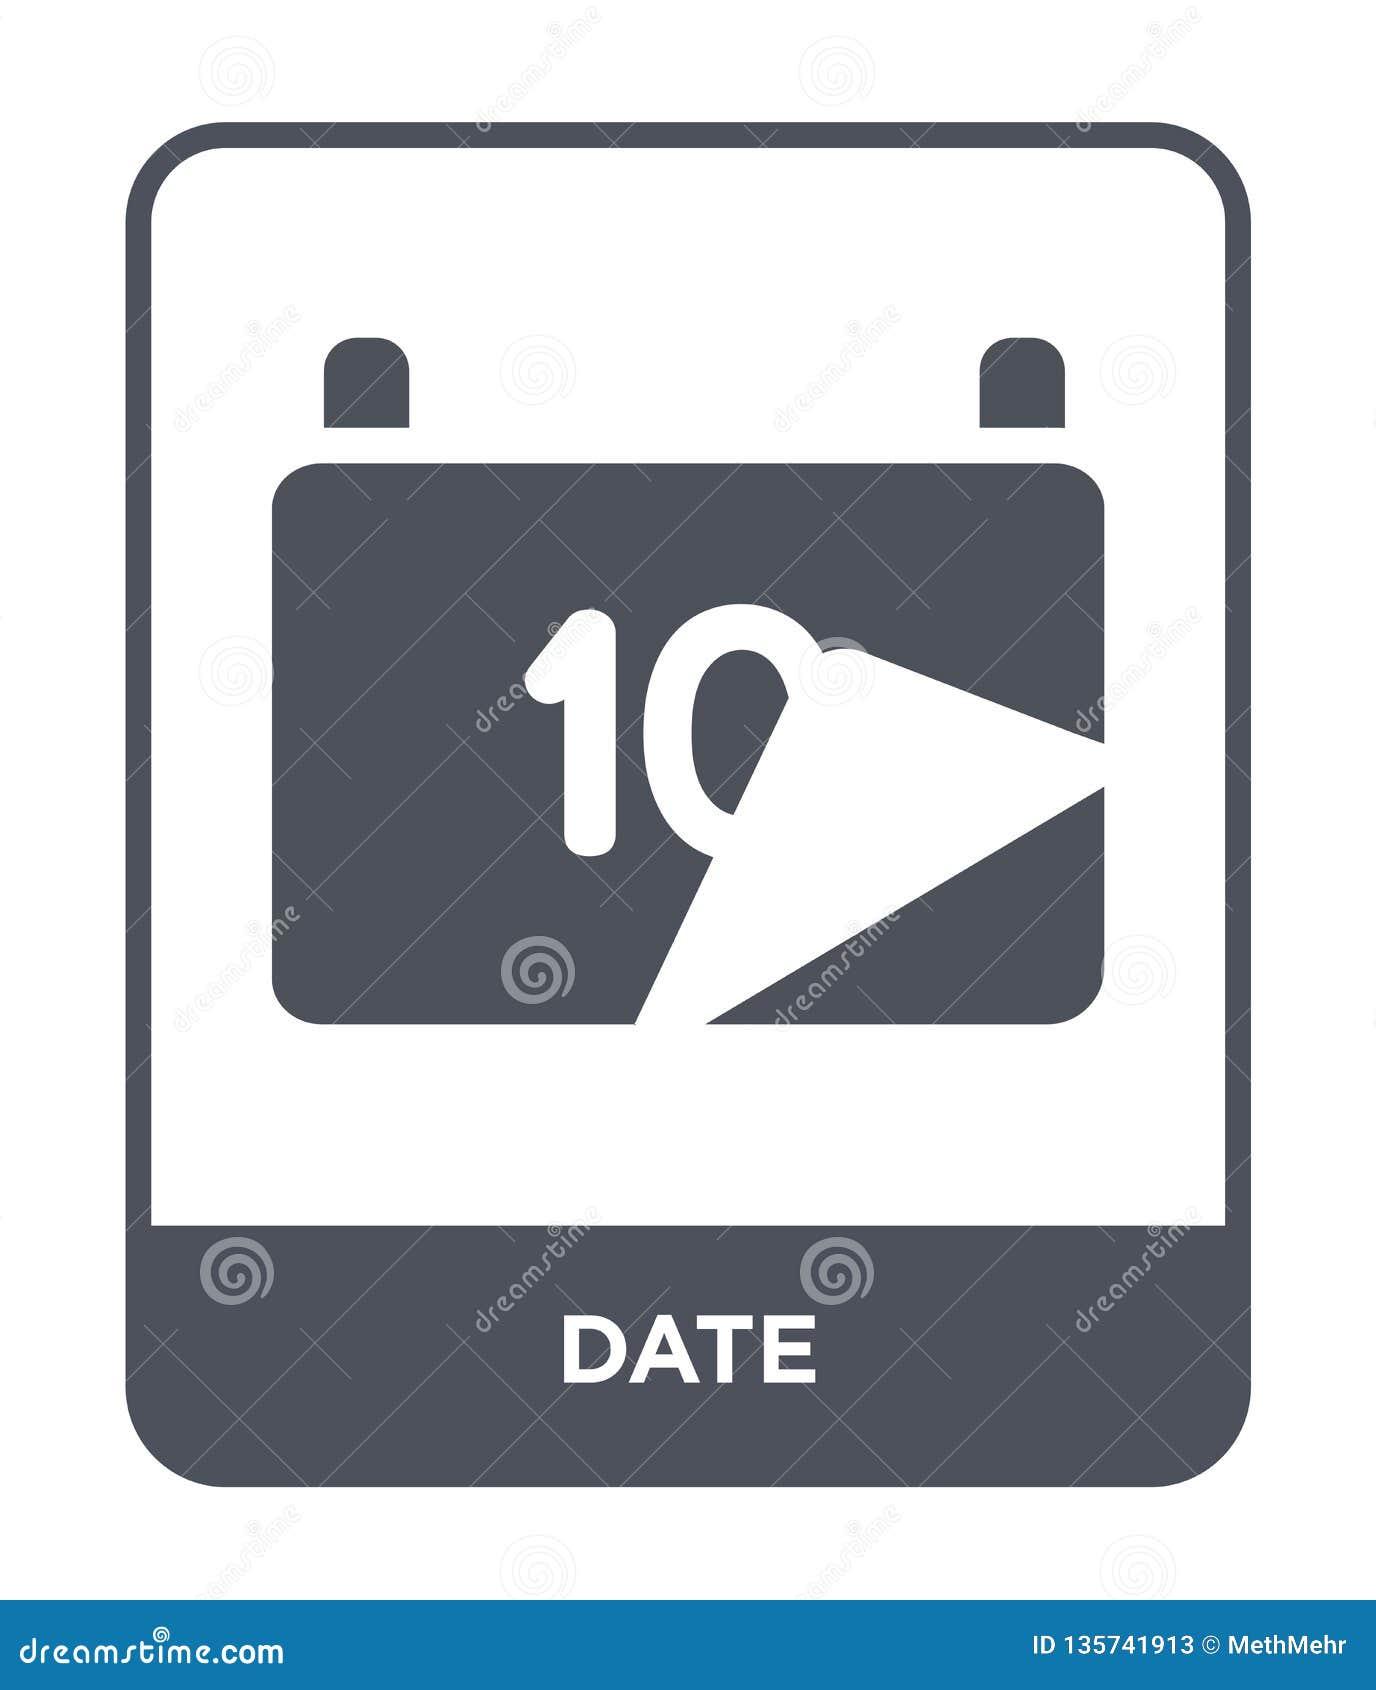 clover dating app customer service